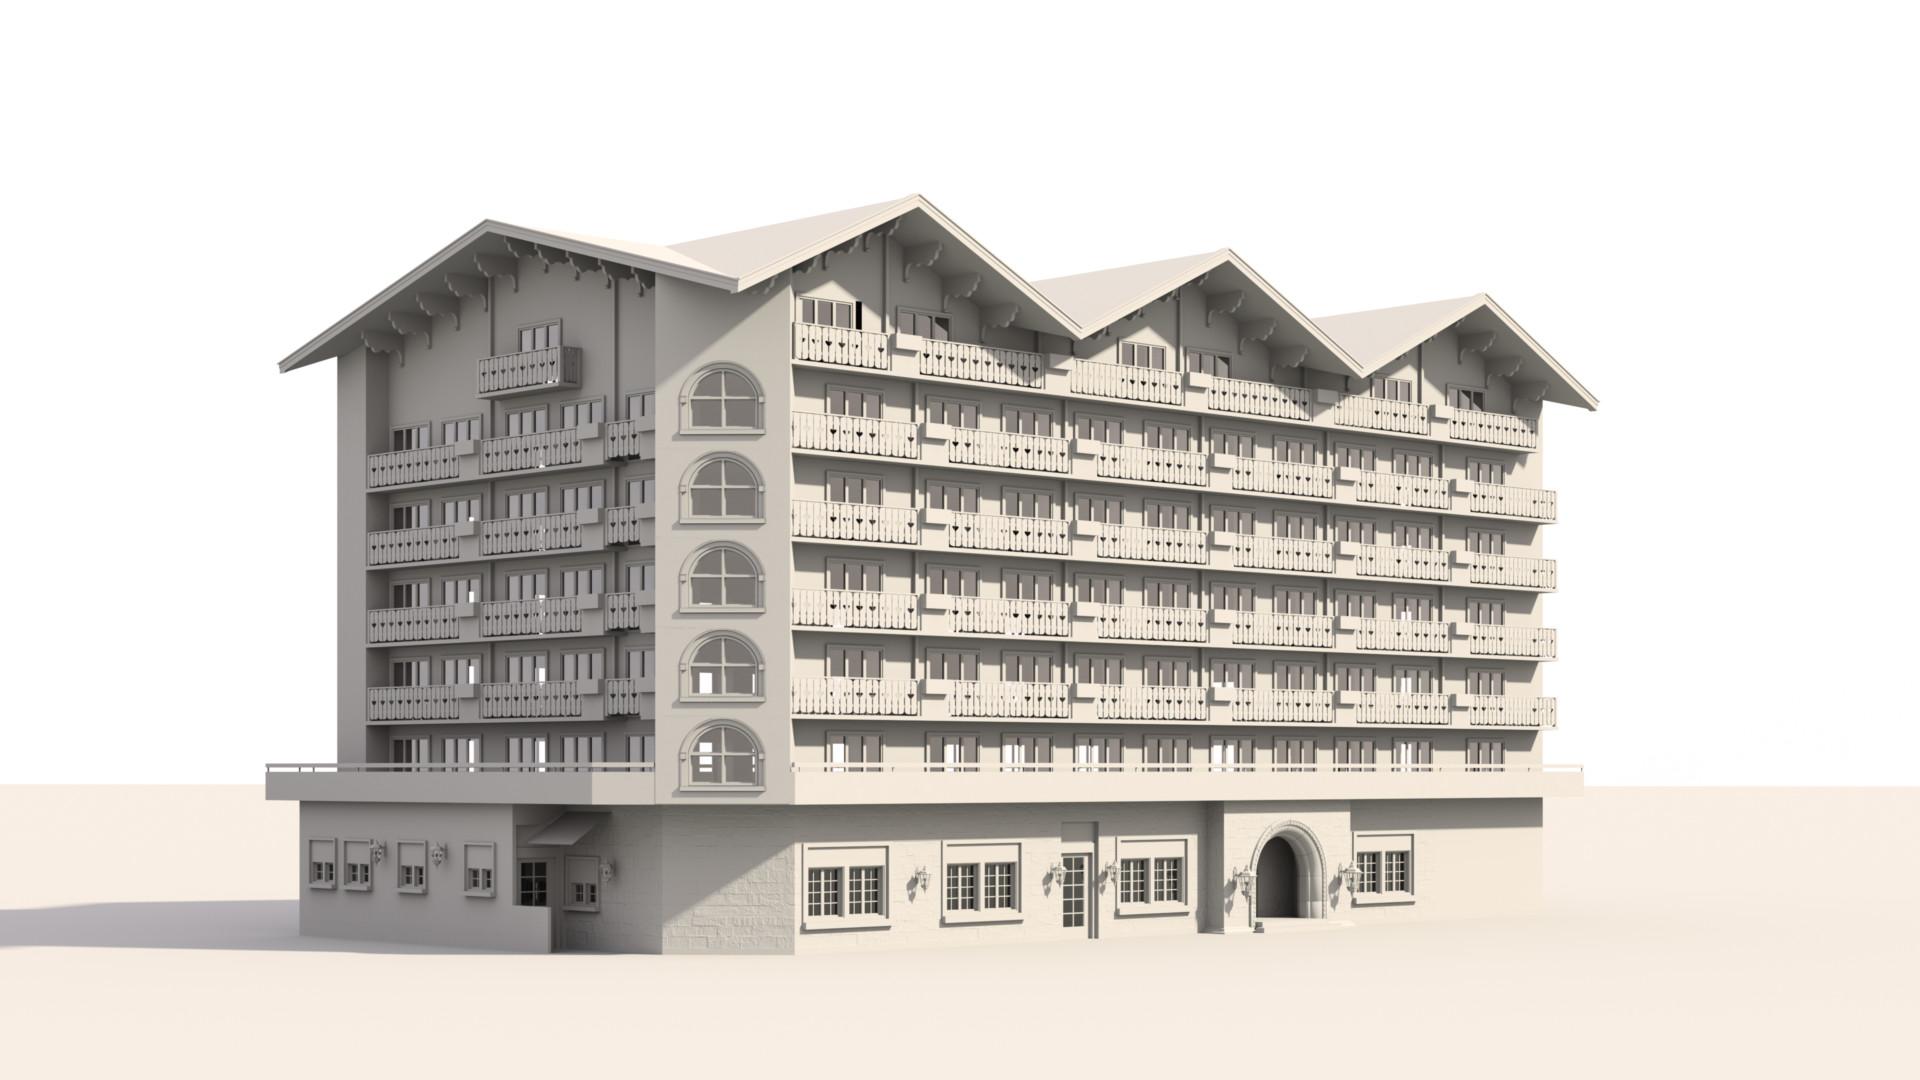 Duane kemp alpine hotel ppe scene 2 clay